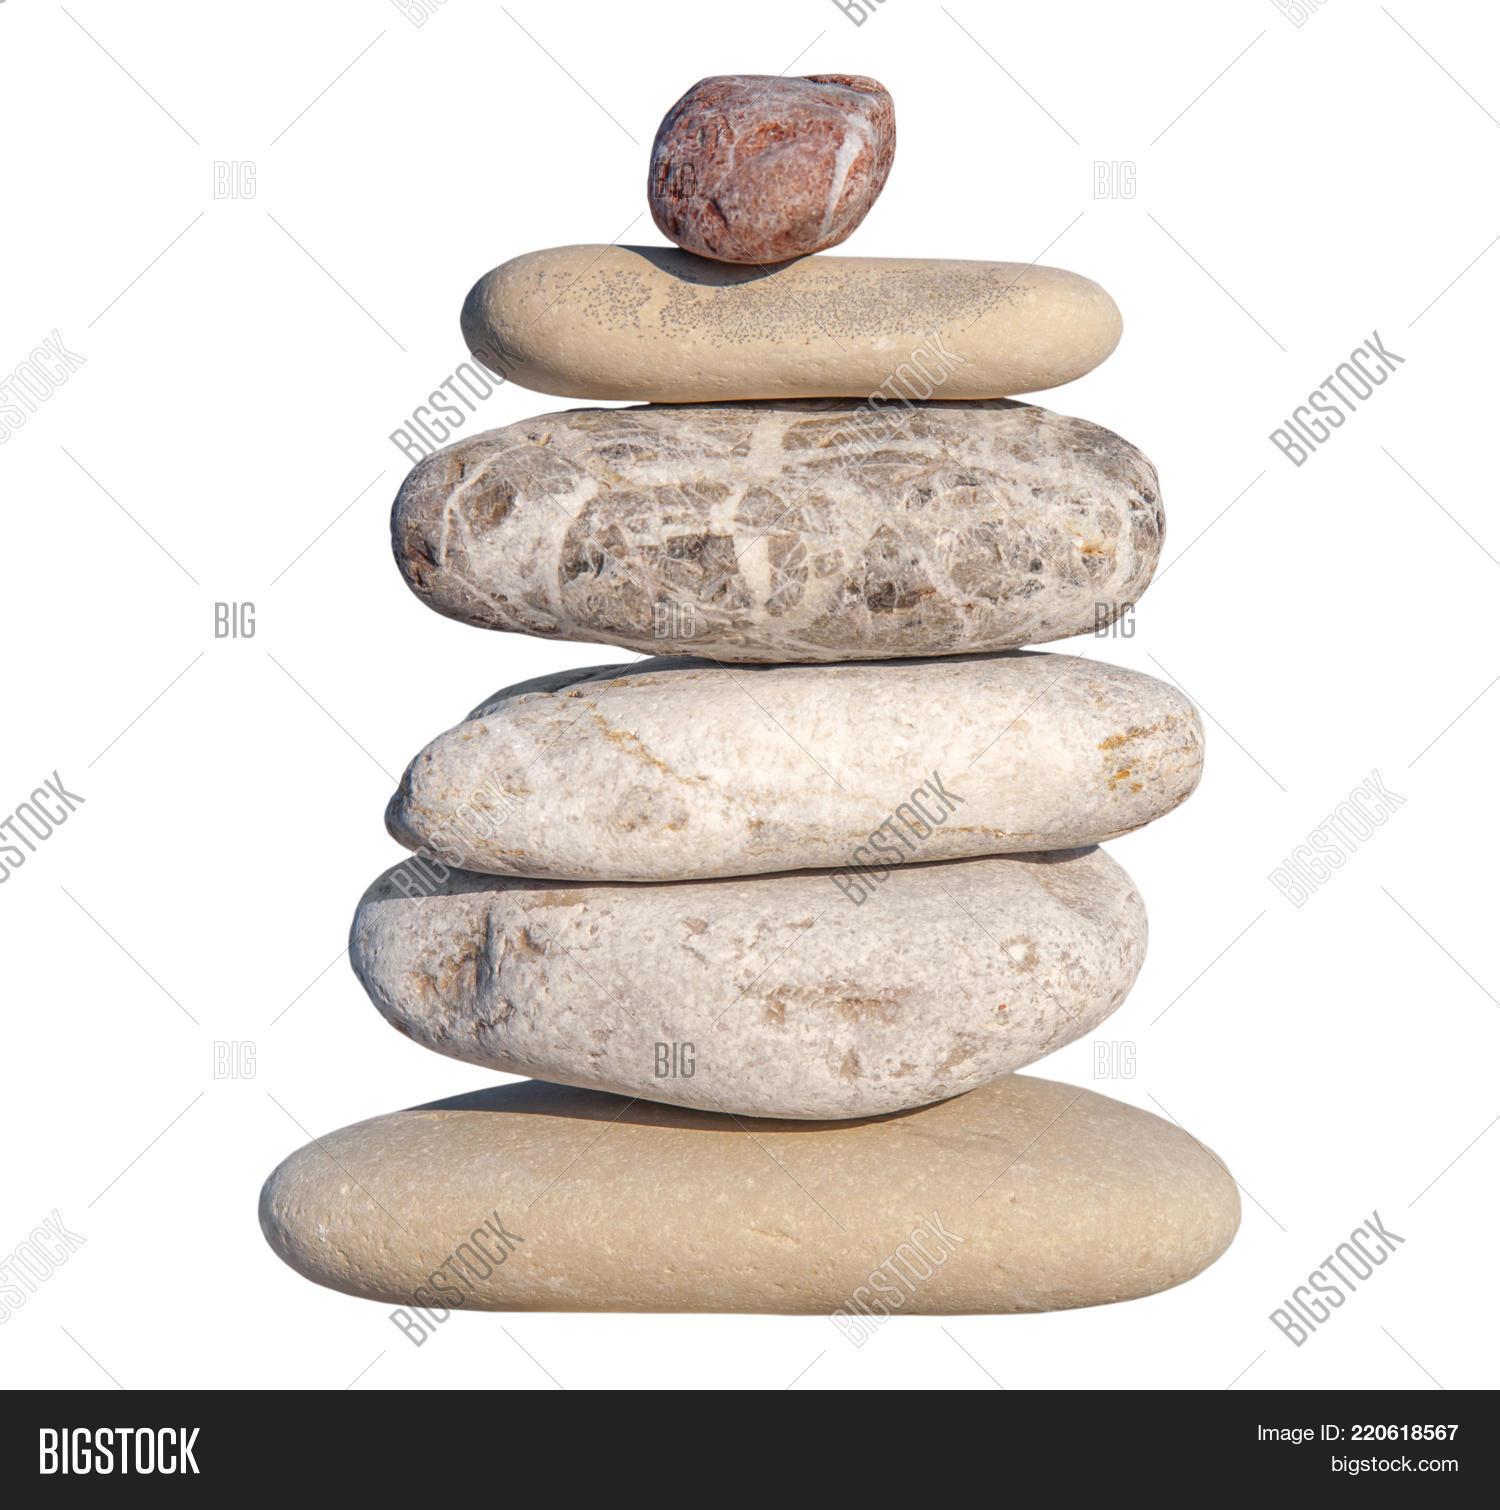 Several Pebble Stone Image Photo Free Trial Bigstock